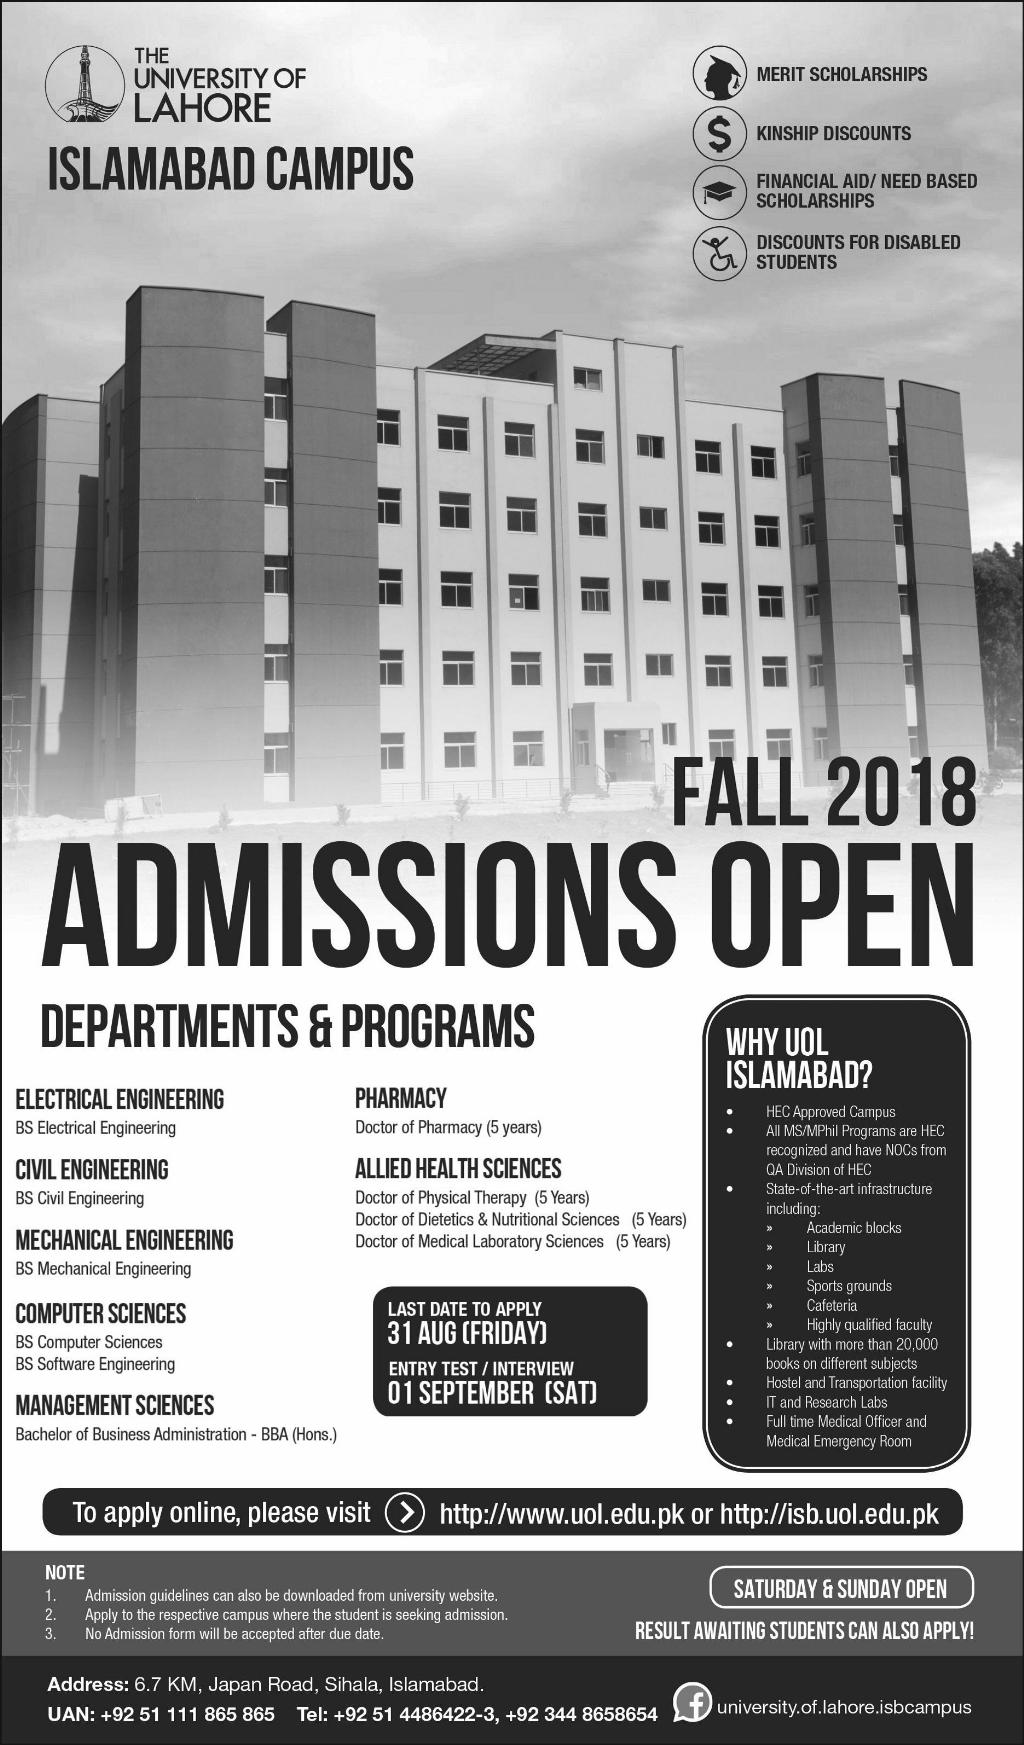 University Of Lahore Islamabad Campus Admission 2018 Last Date